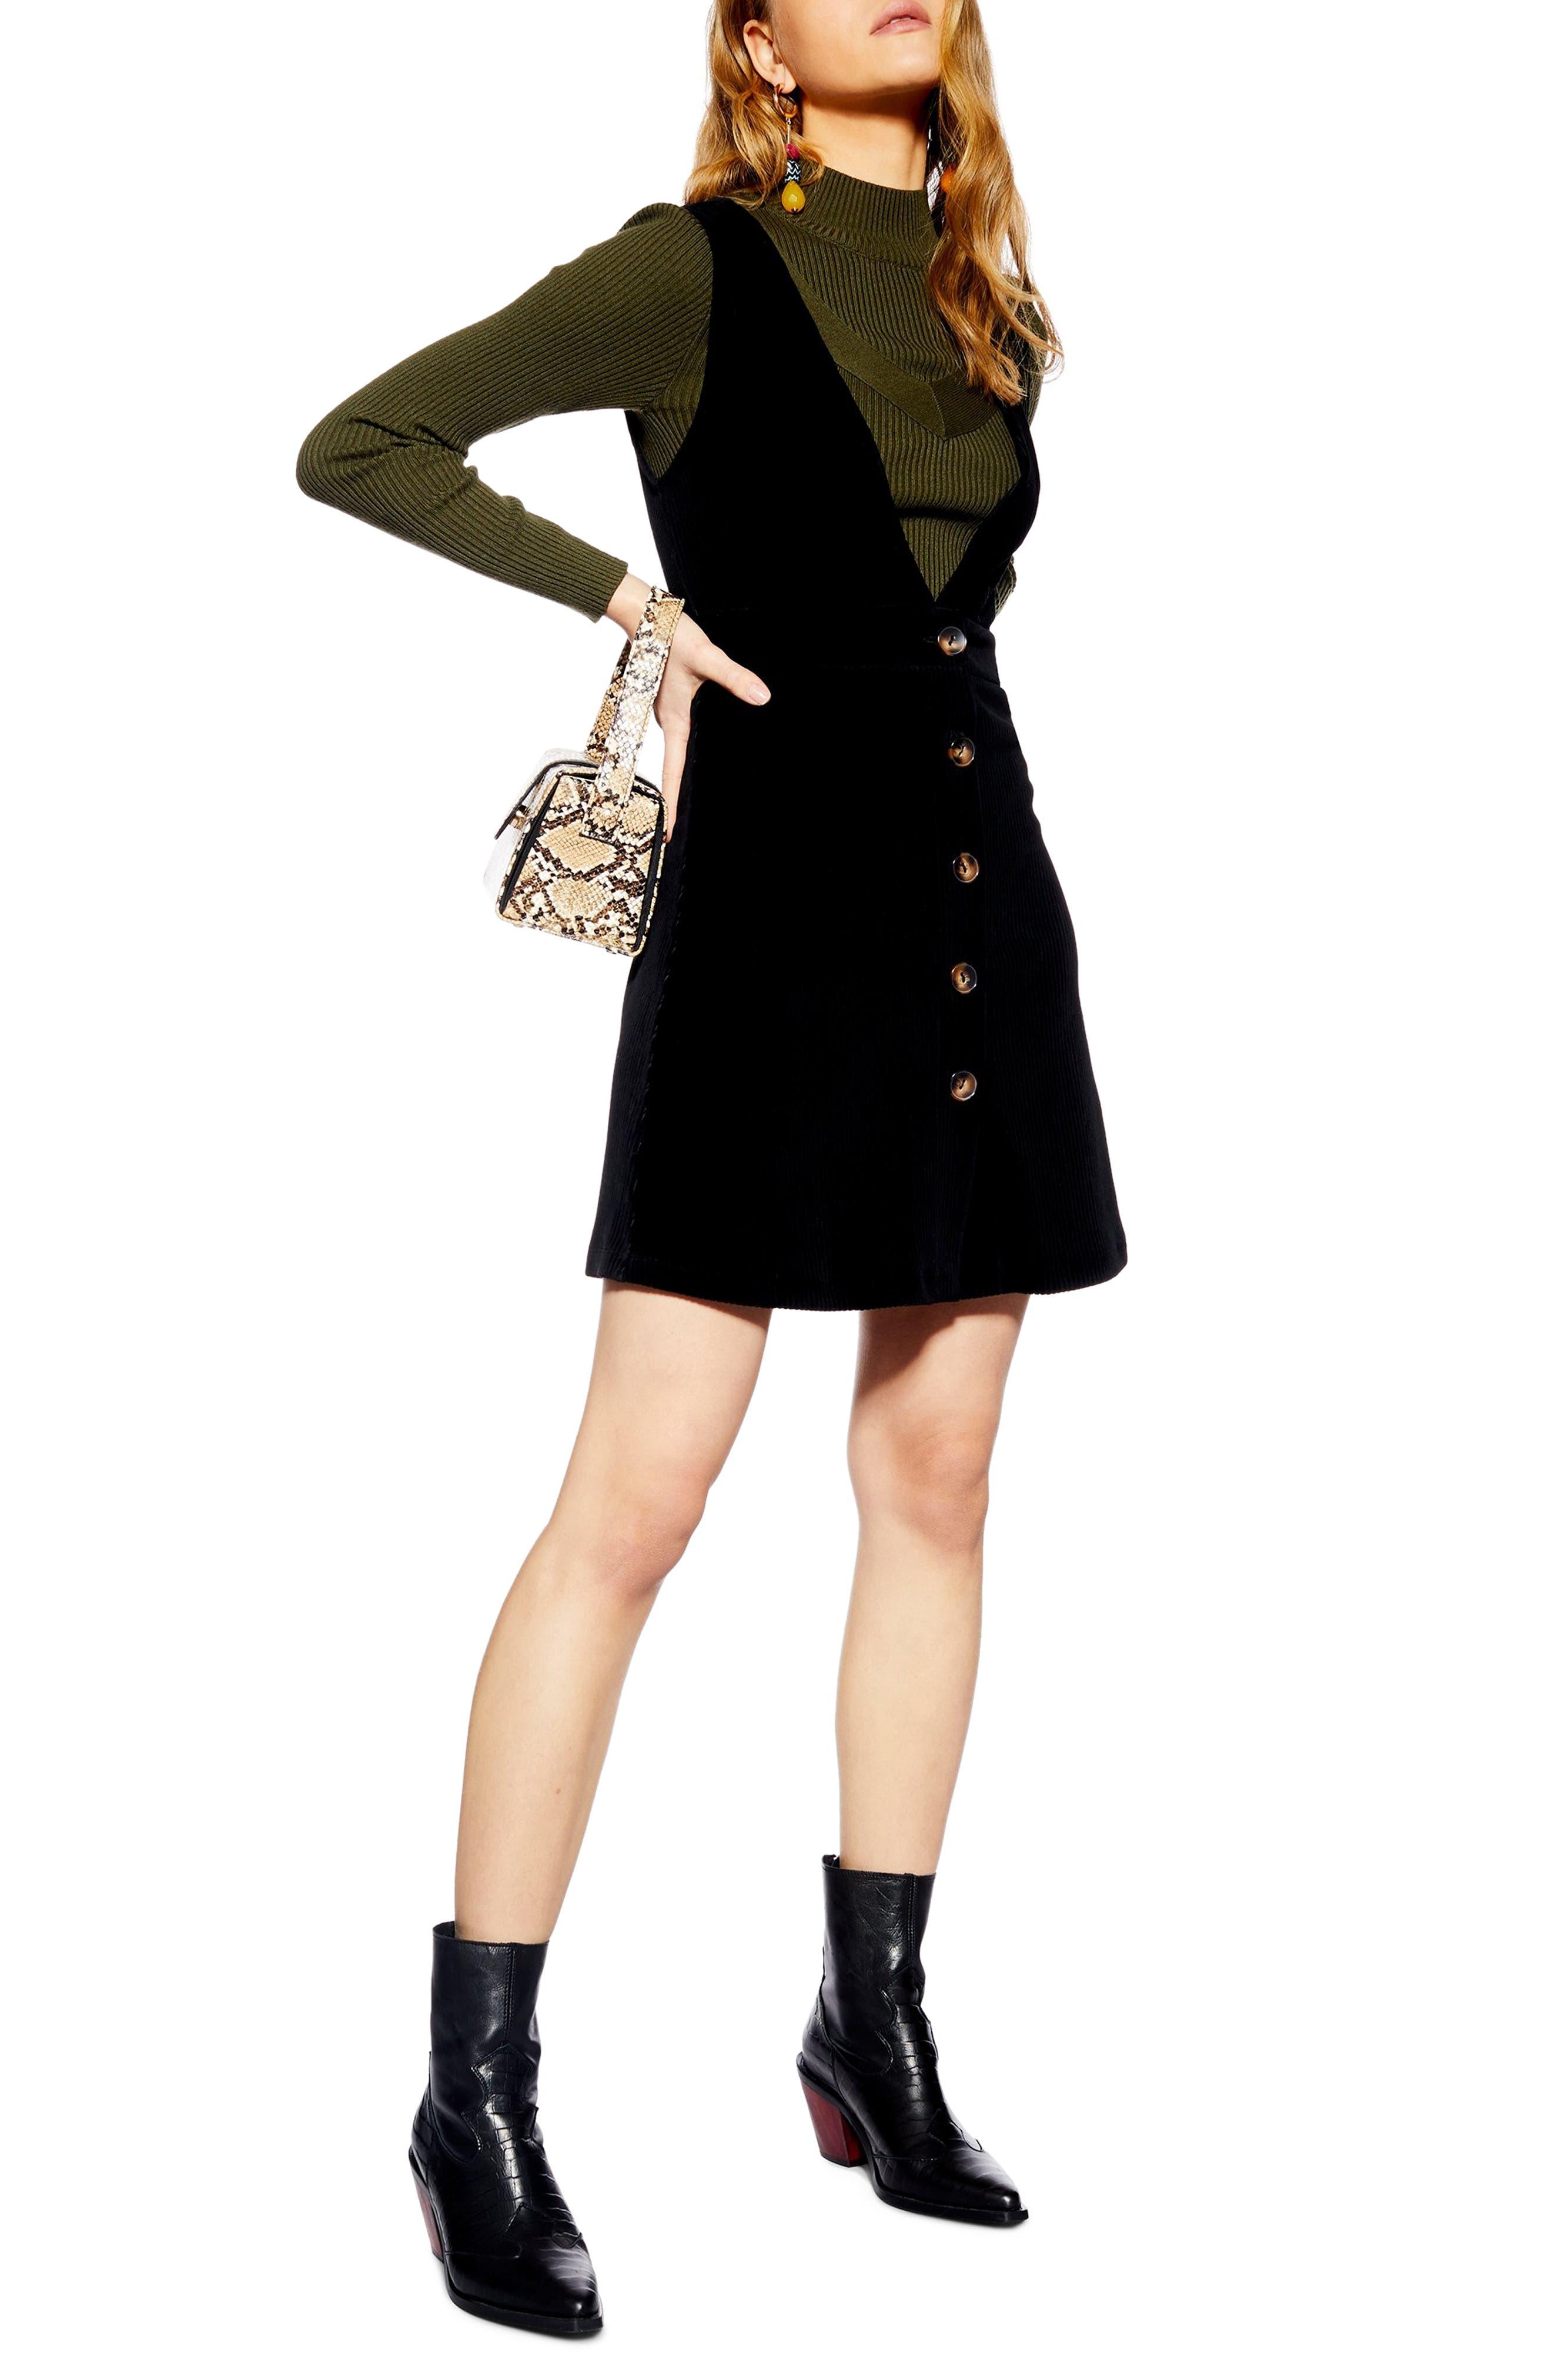 Topshop Corduroy Pinafore Dress, US (fits like 6-8) - Black